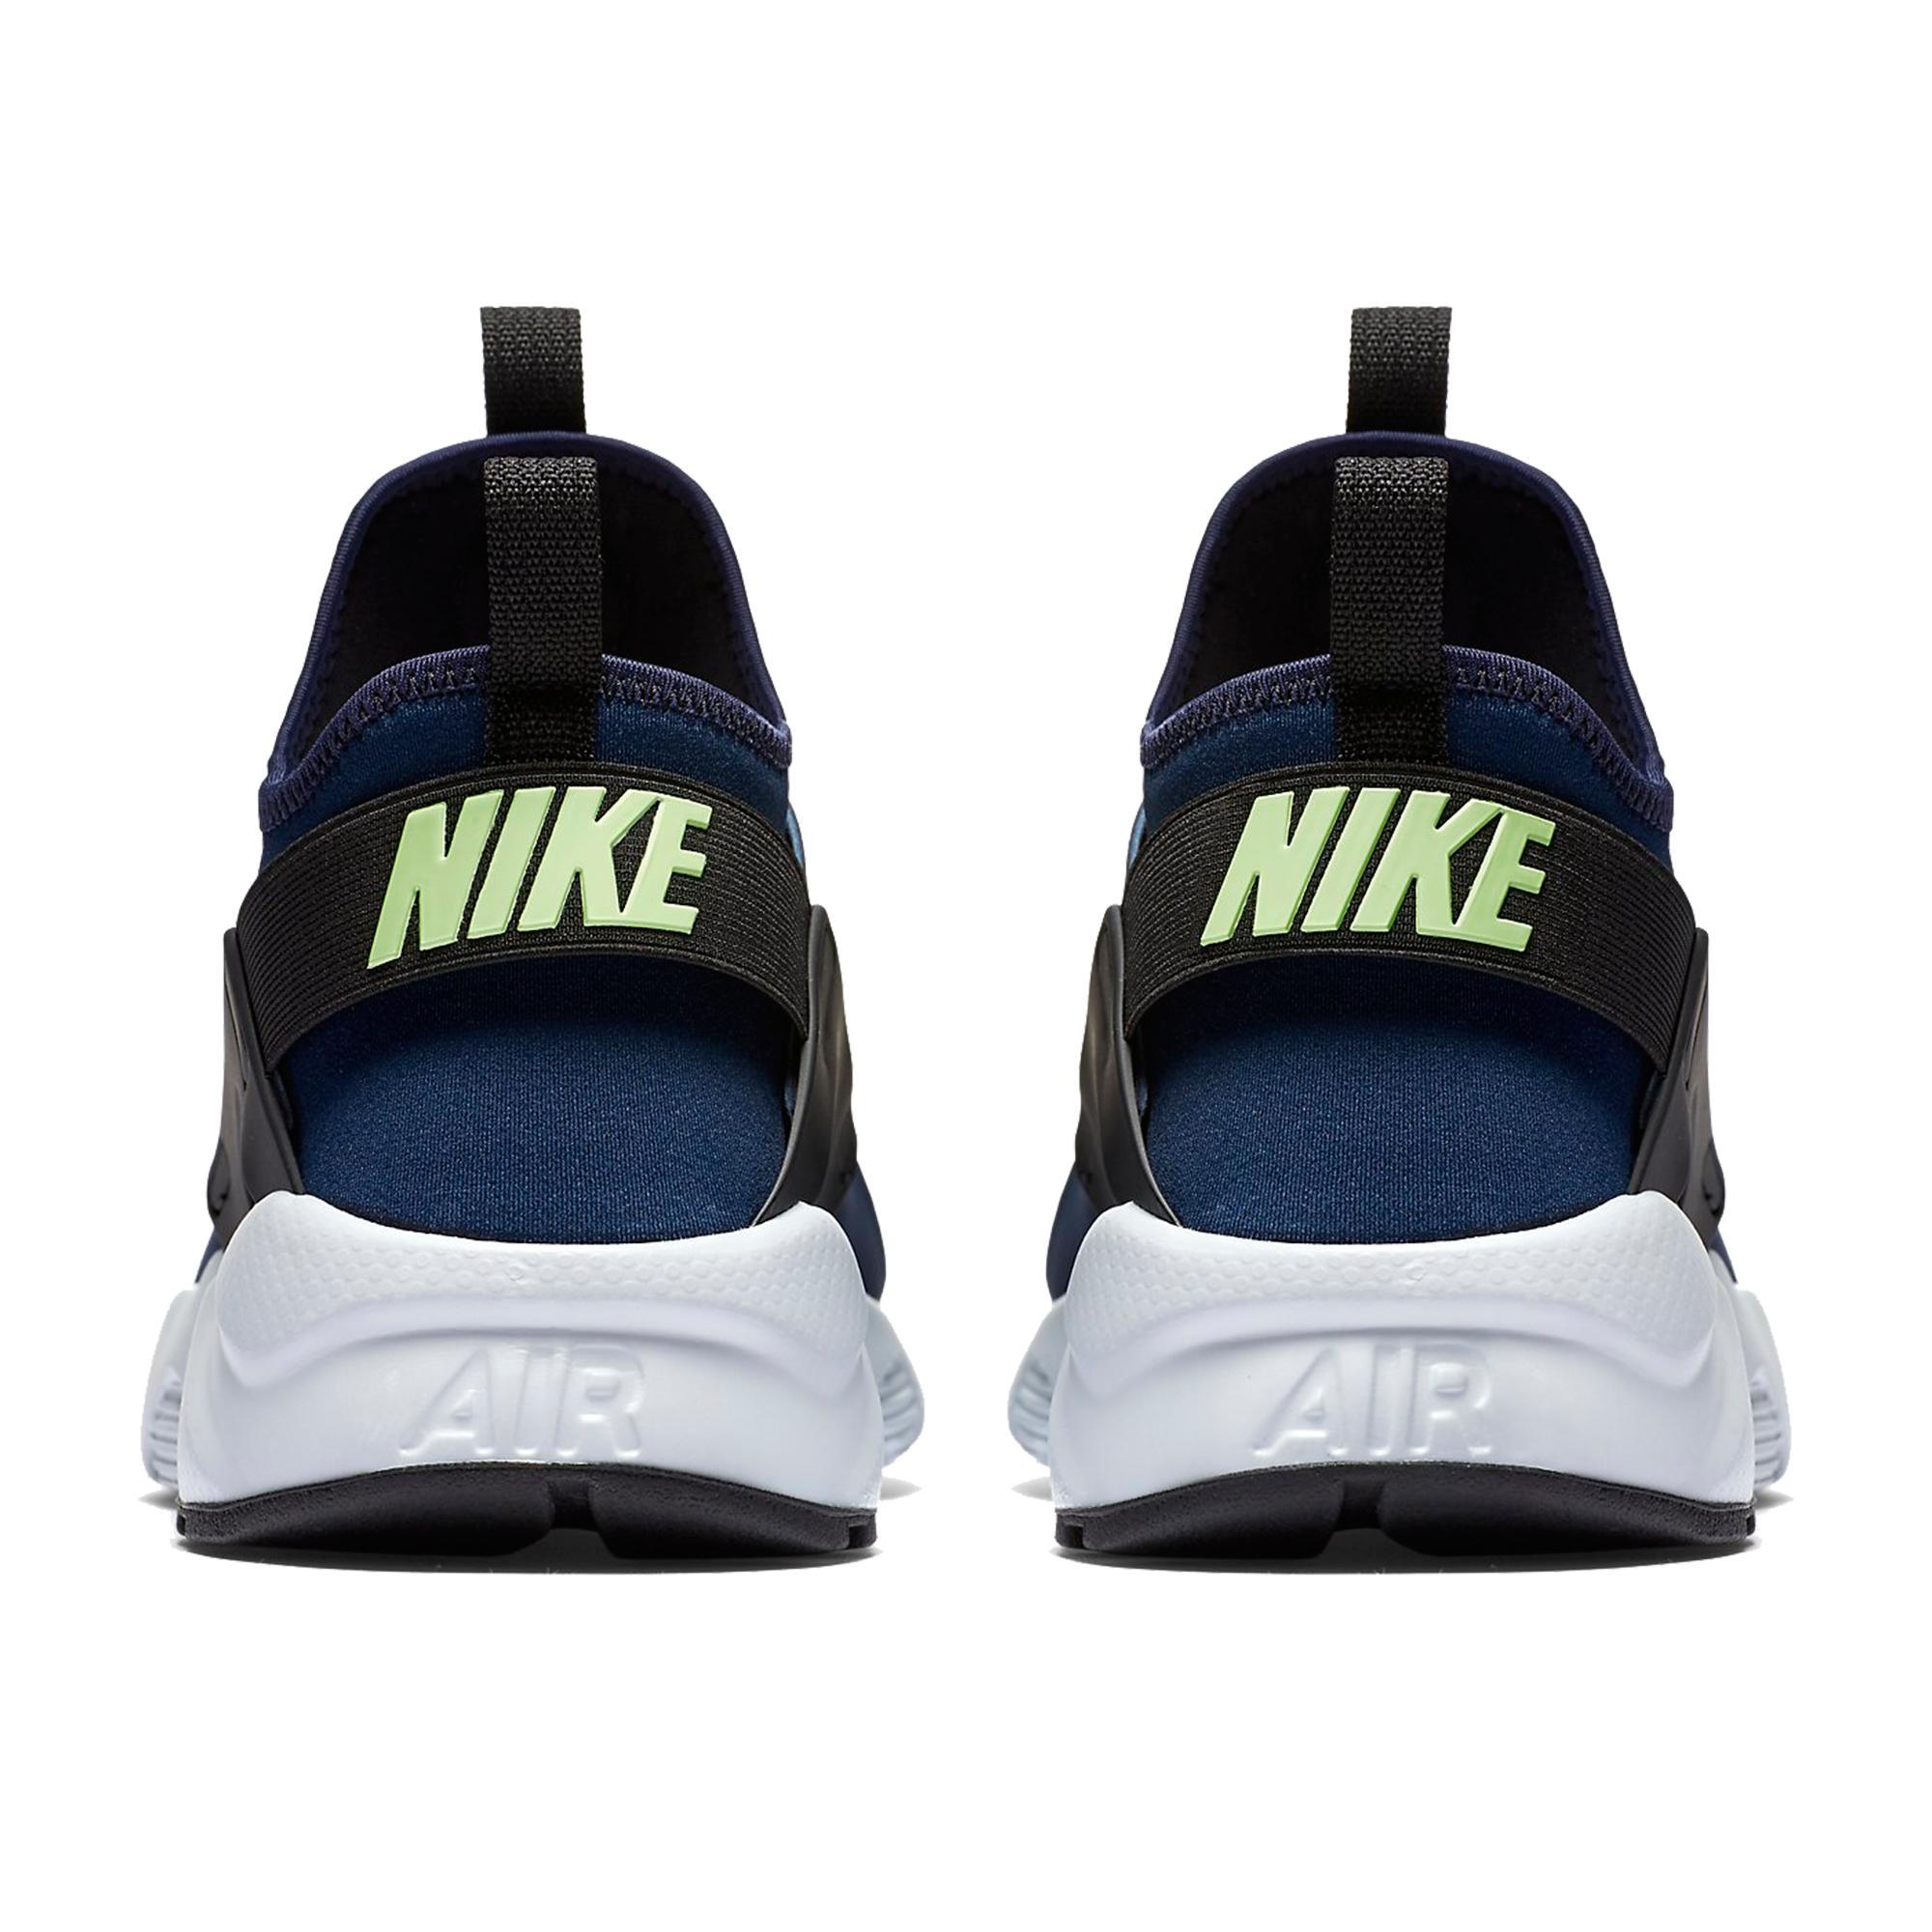 13957a7c73a28 Nike Air Huarache Run Ultra FW16 Erkek Spor Ayakkabı  819685-403 ...